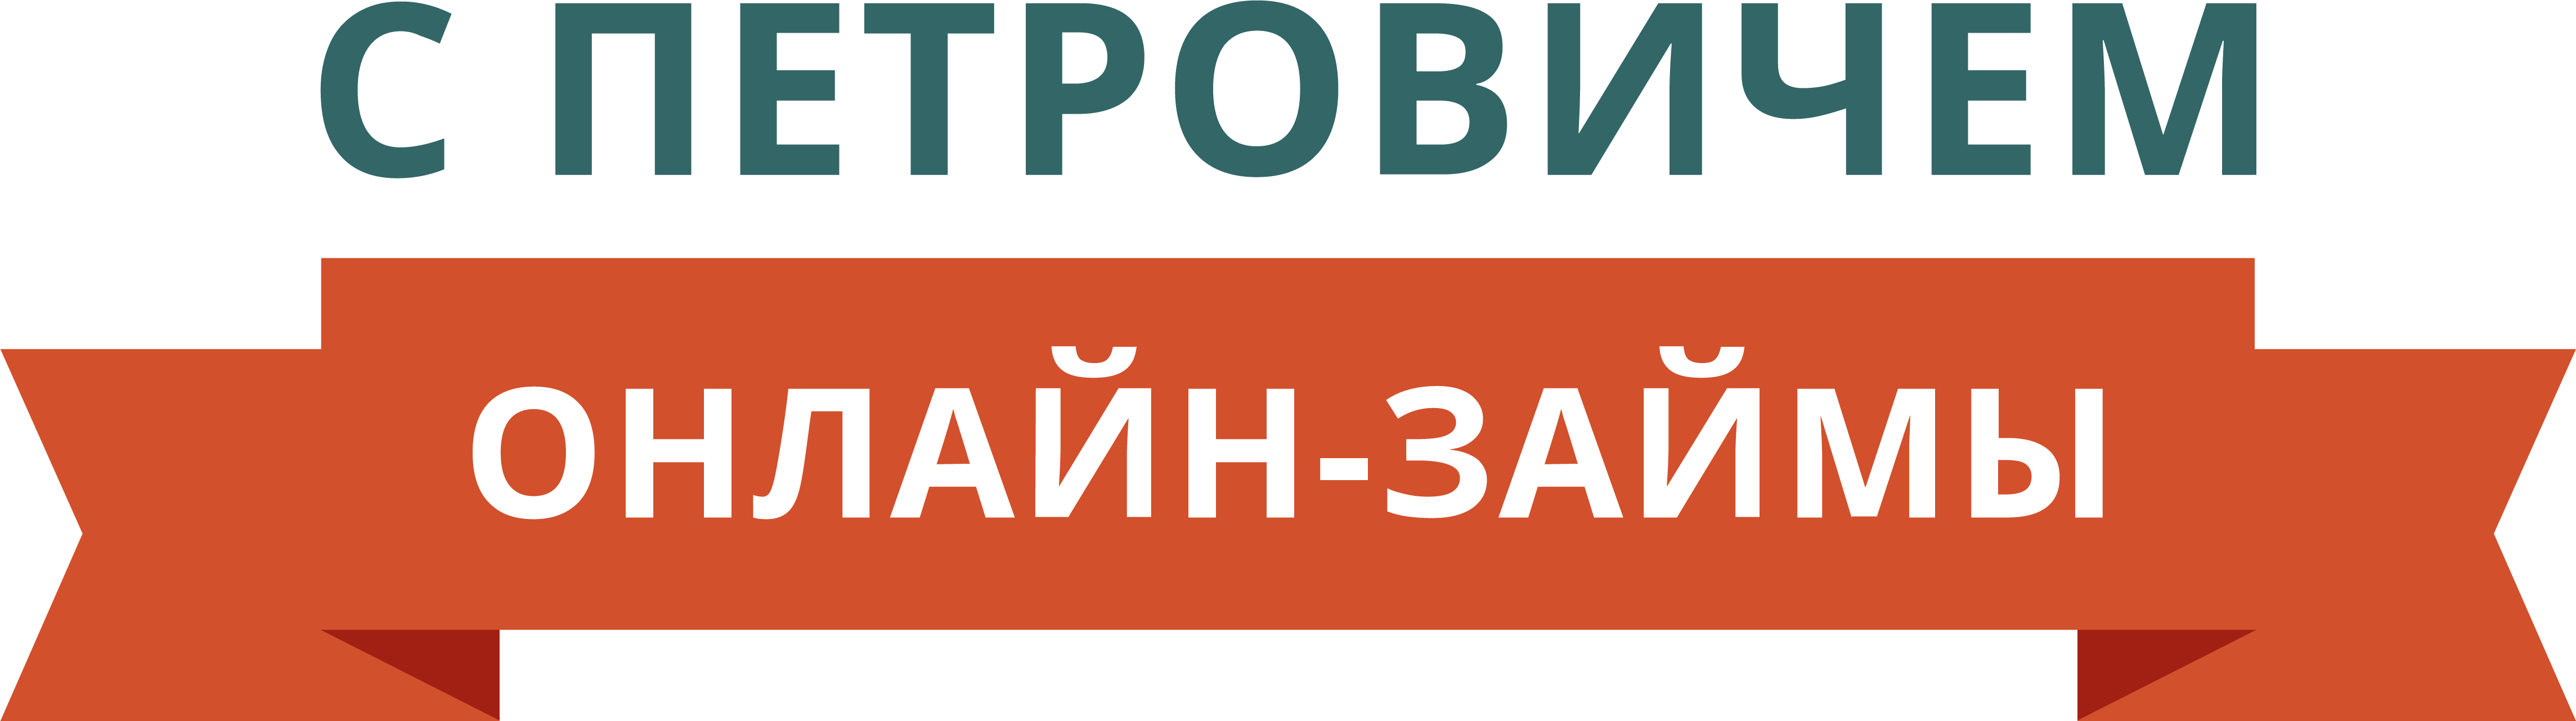 С Петровичем